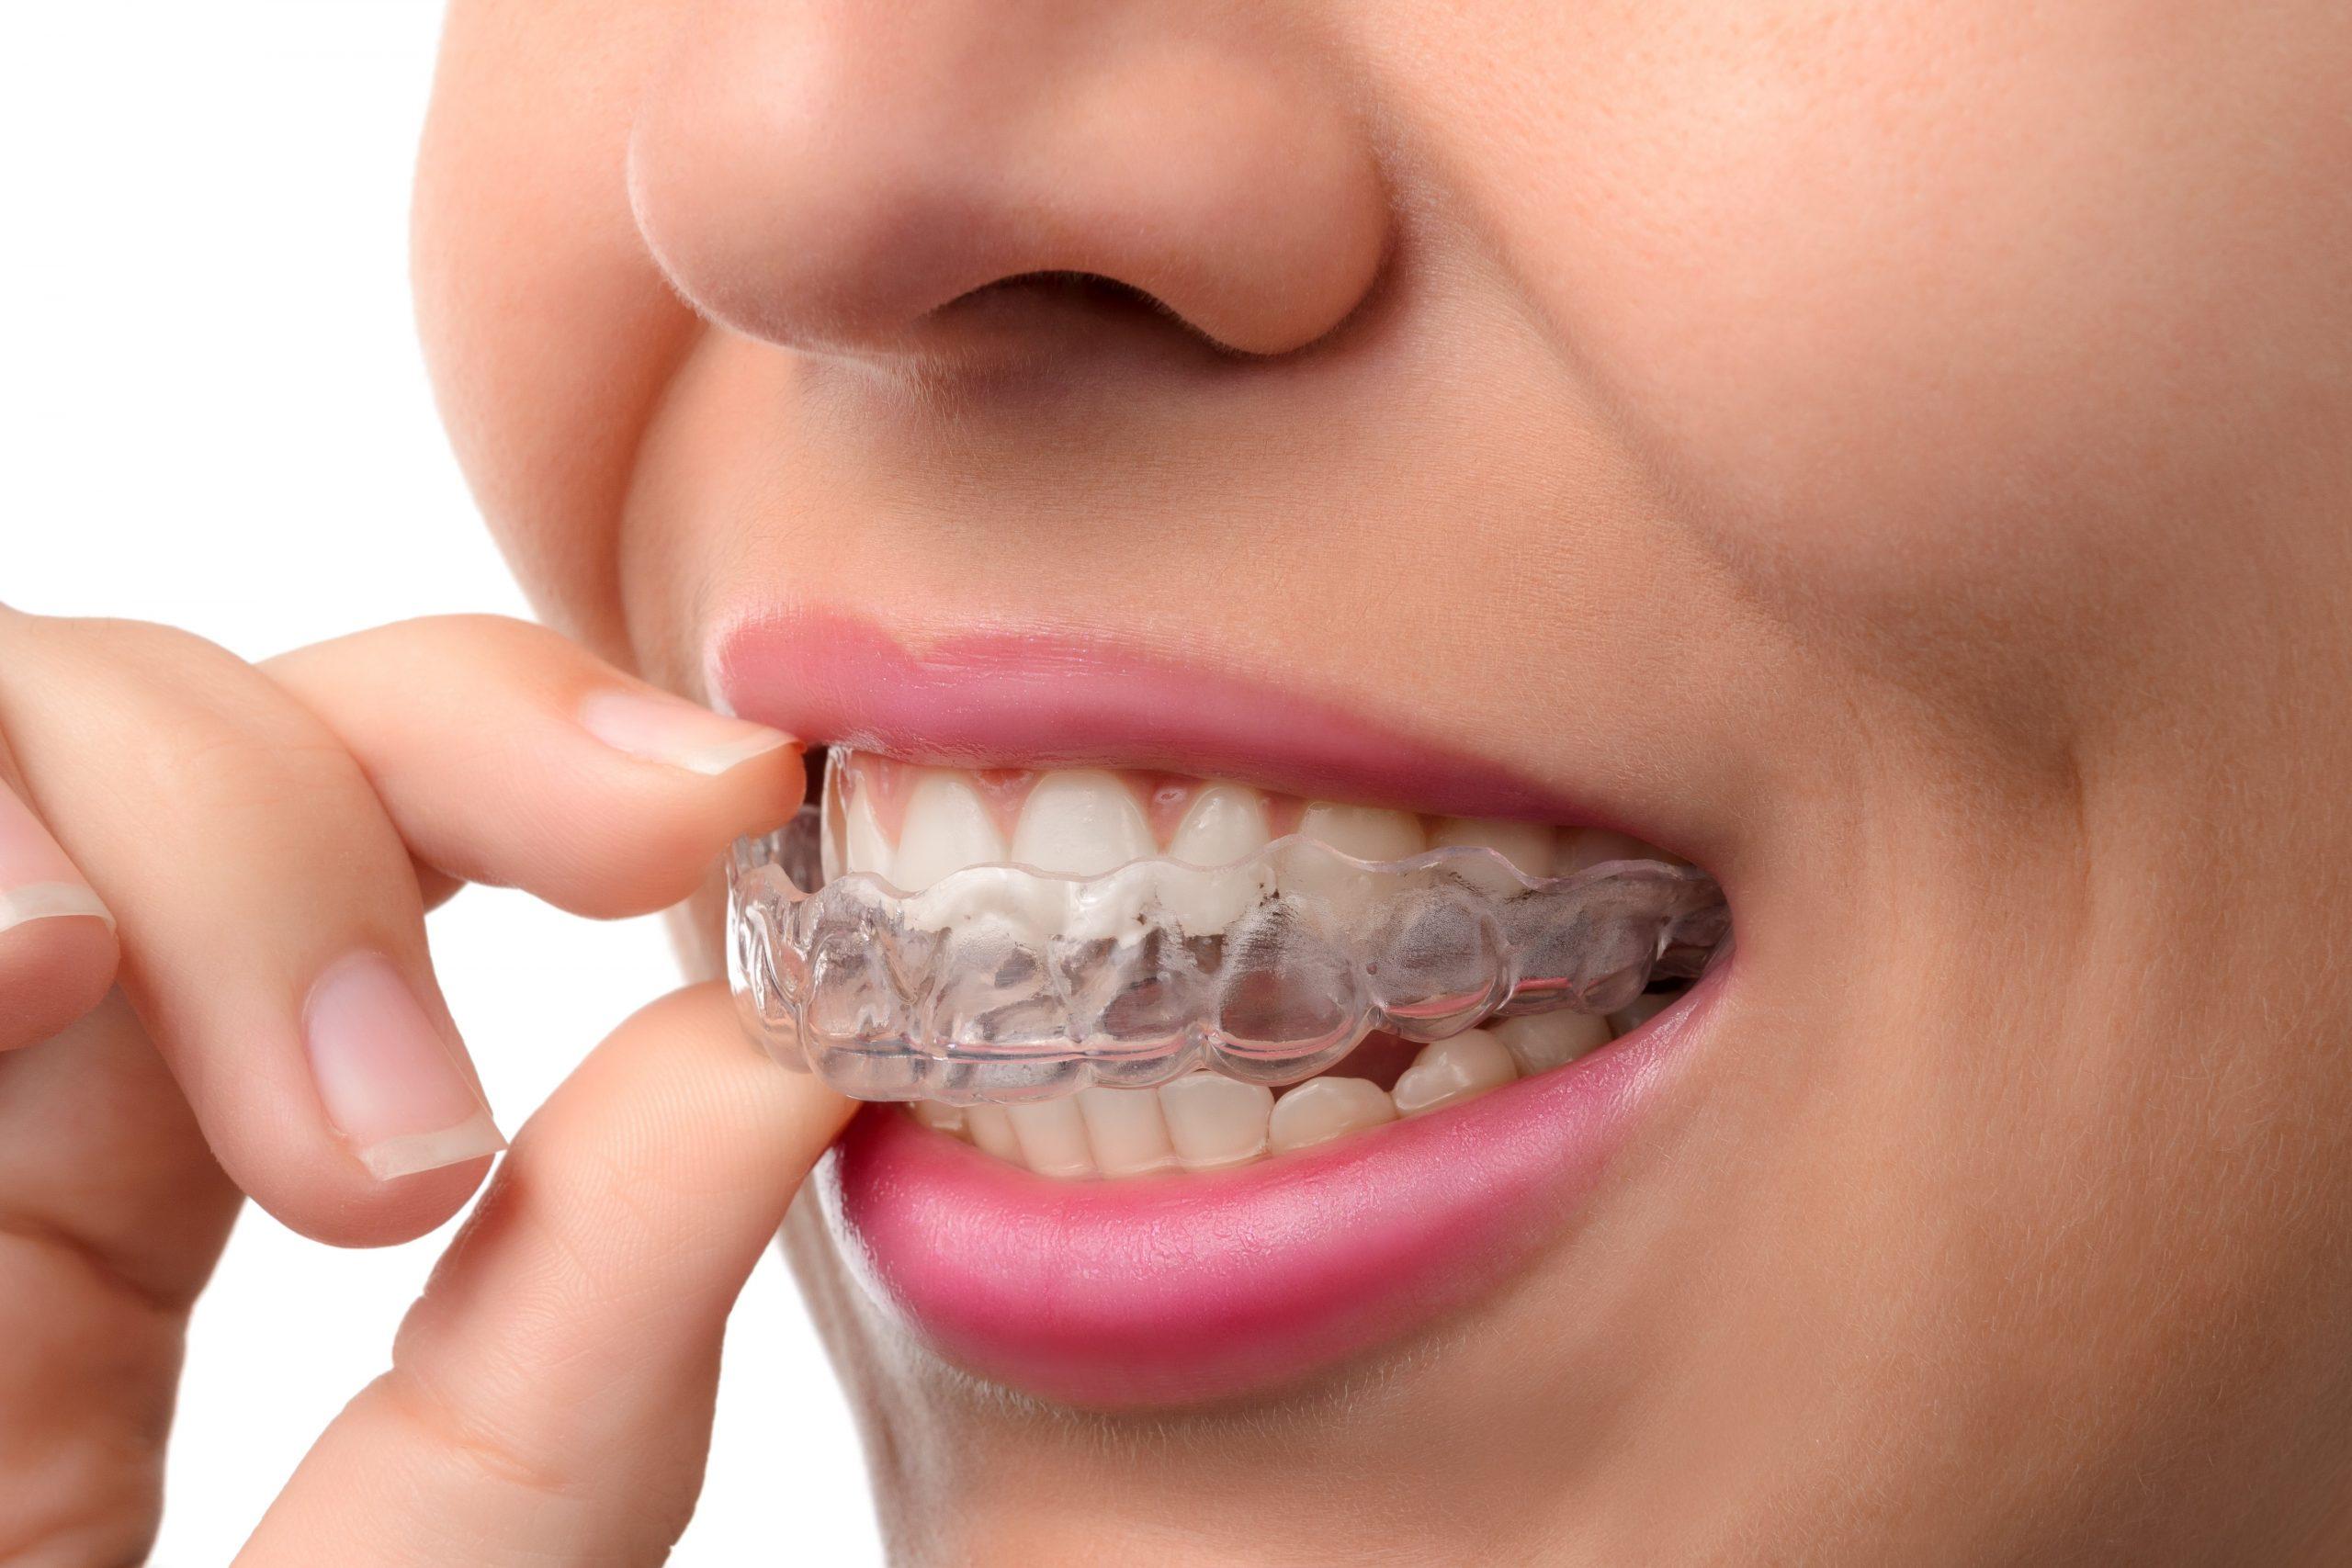 Femeie in timp ce isi pune aparatul dentar Invisalign